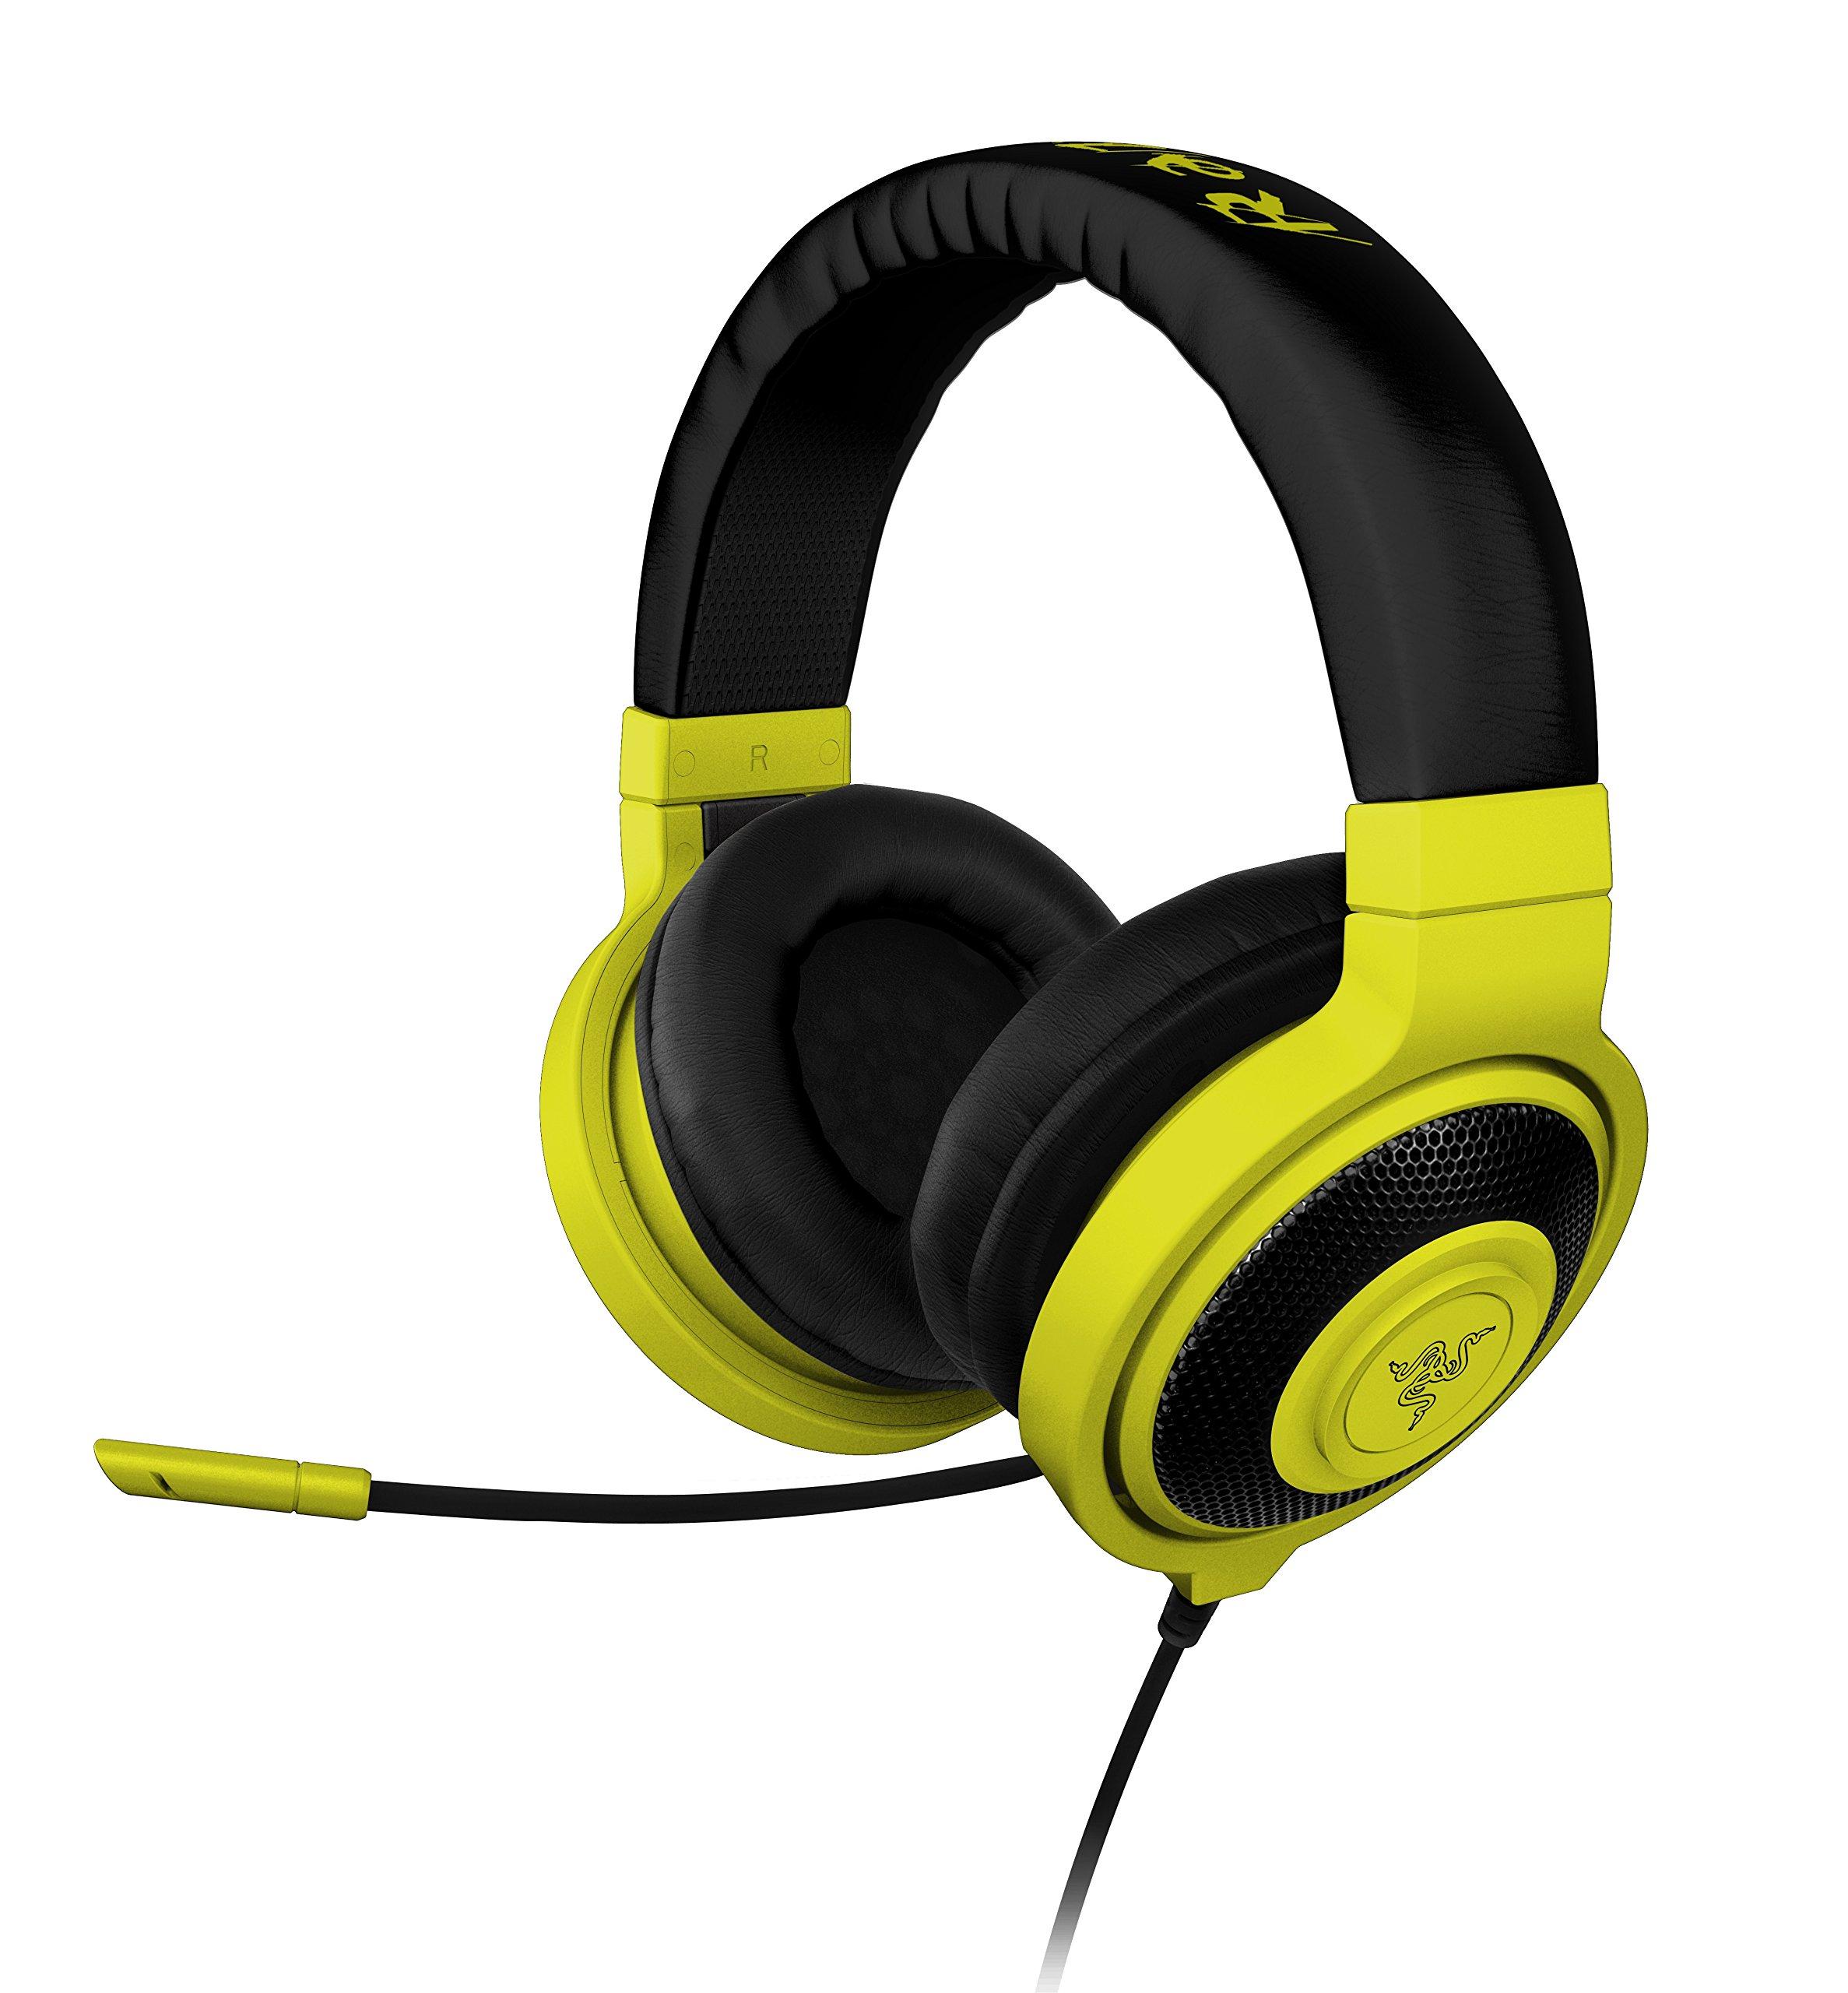 Razer Kraken PRO Over Ear PC and Music Headset - Neon Yellow